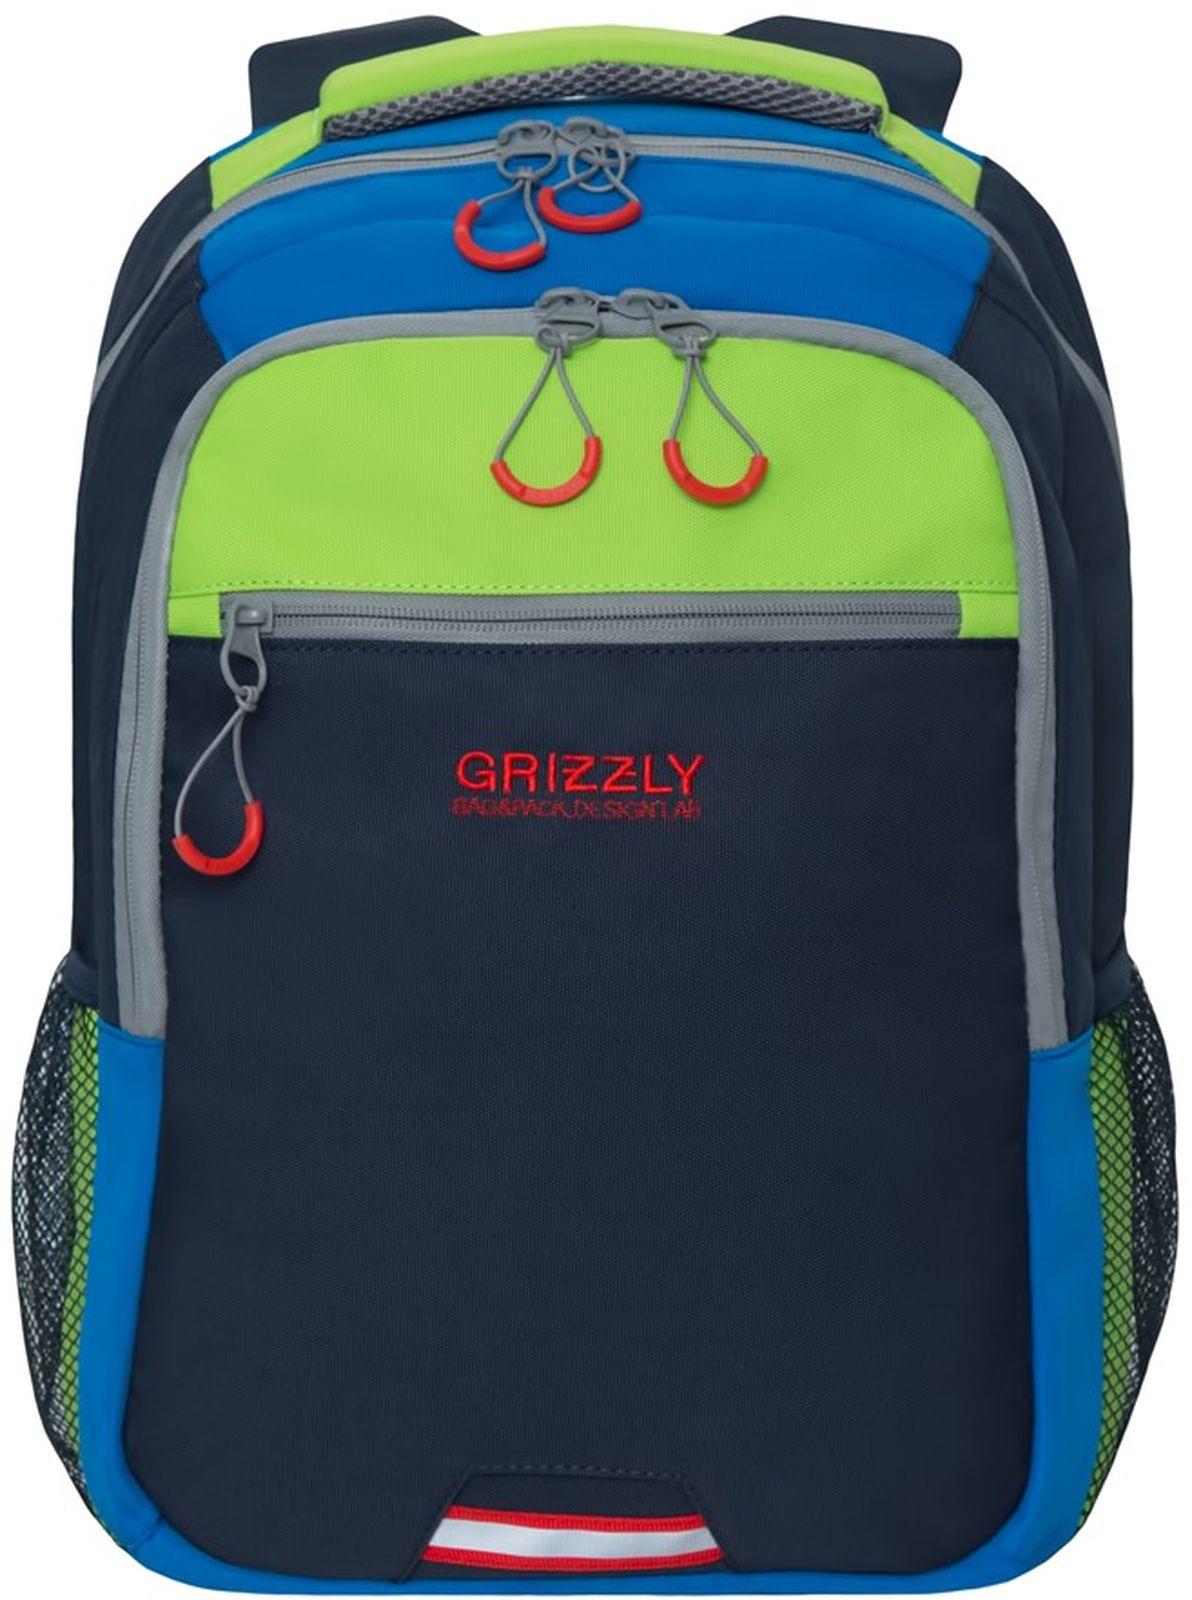 Рюкзак Grizzly, RU-922-3/3, салатовый, синий рюкзак grizzly ru 804 3 2 black lime green